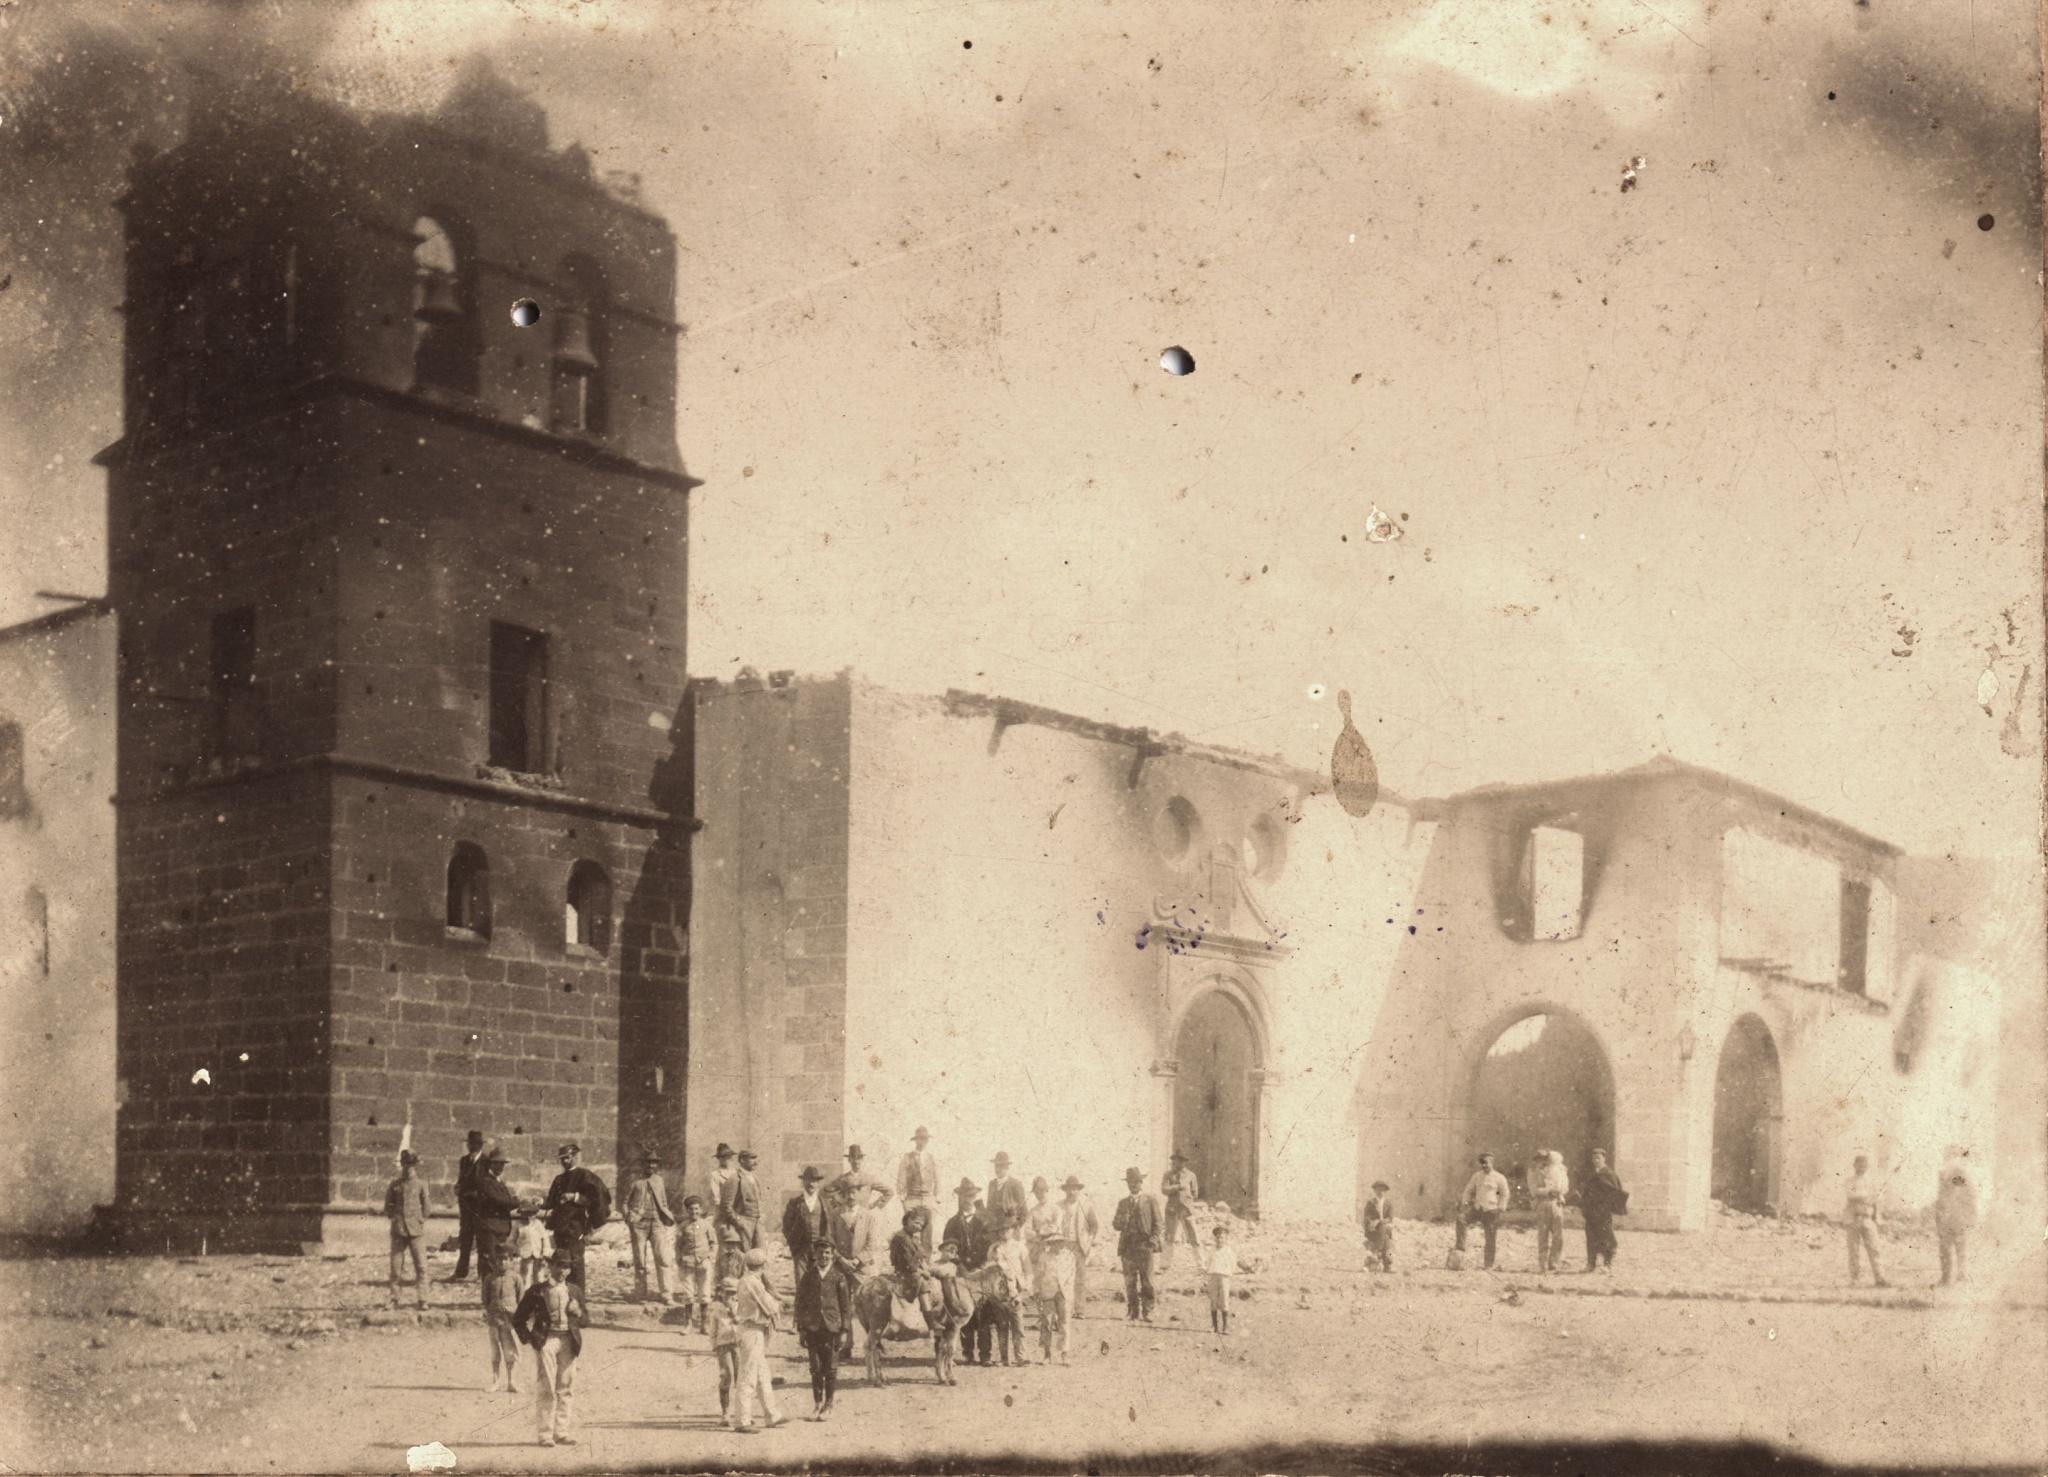 La iglesia incendiada en 1909